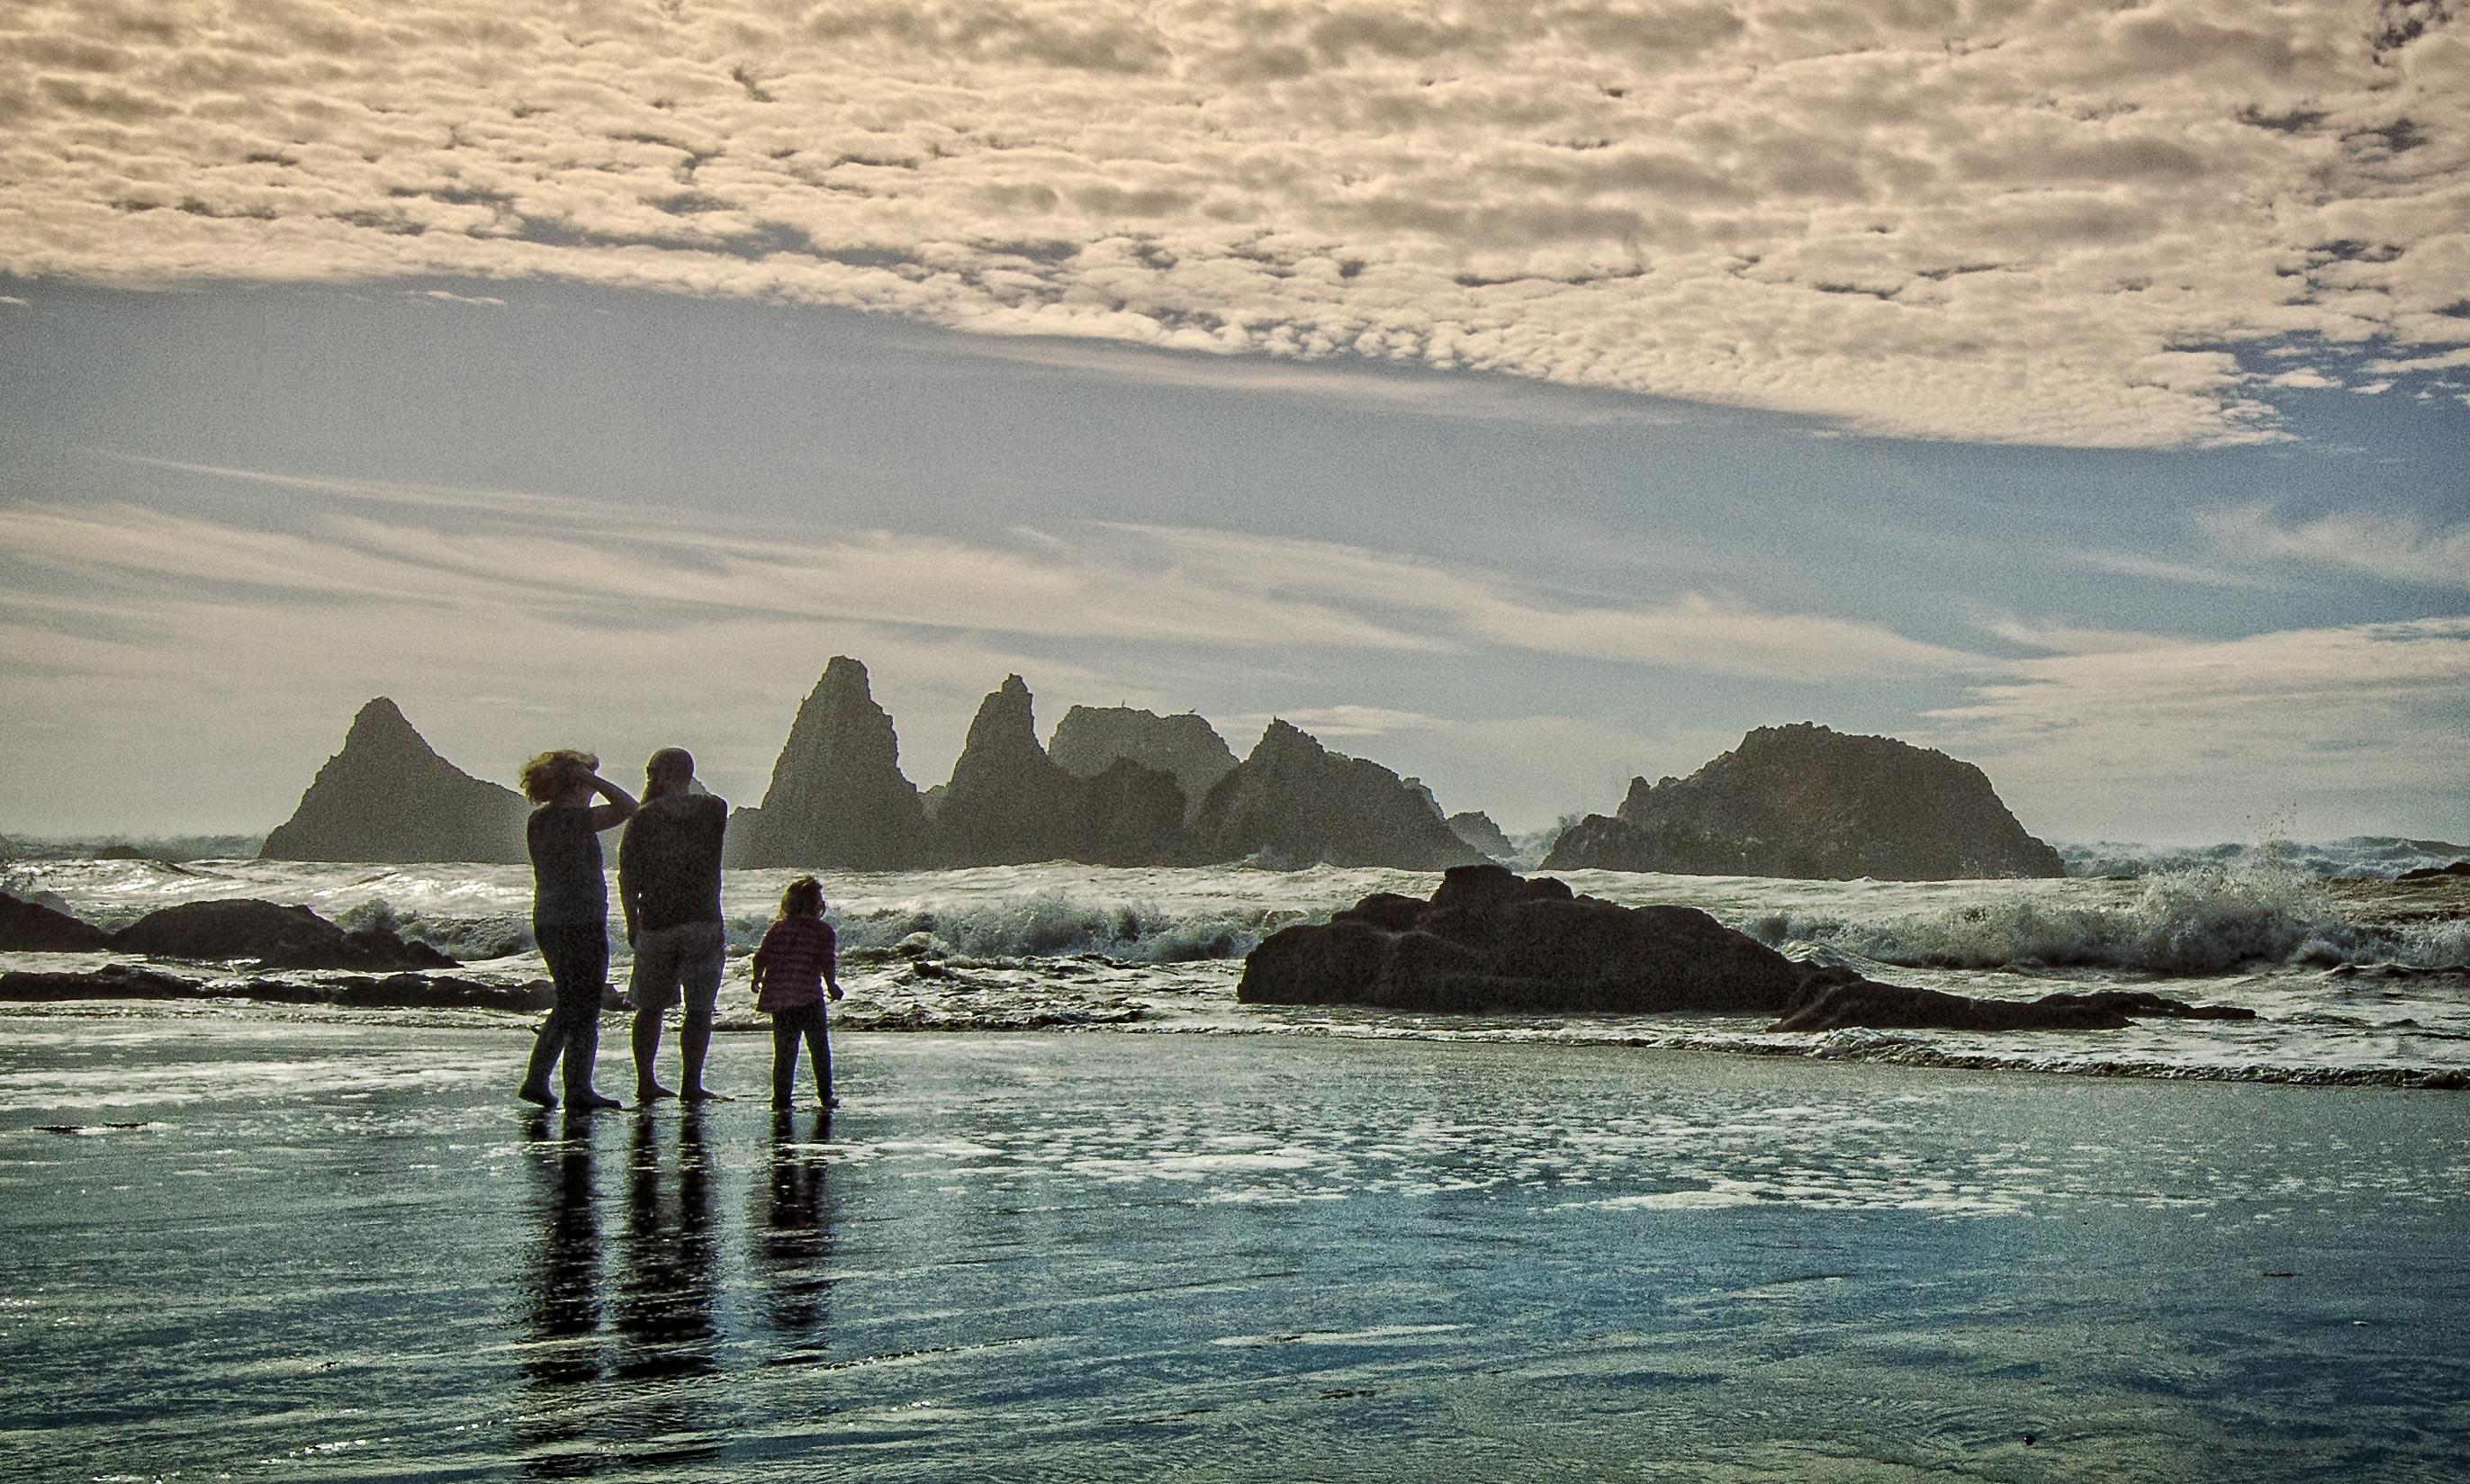 Seal Rock family waders